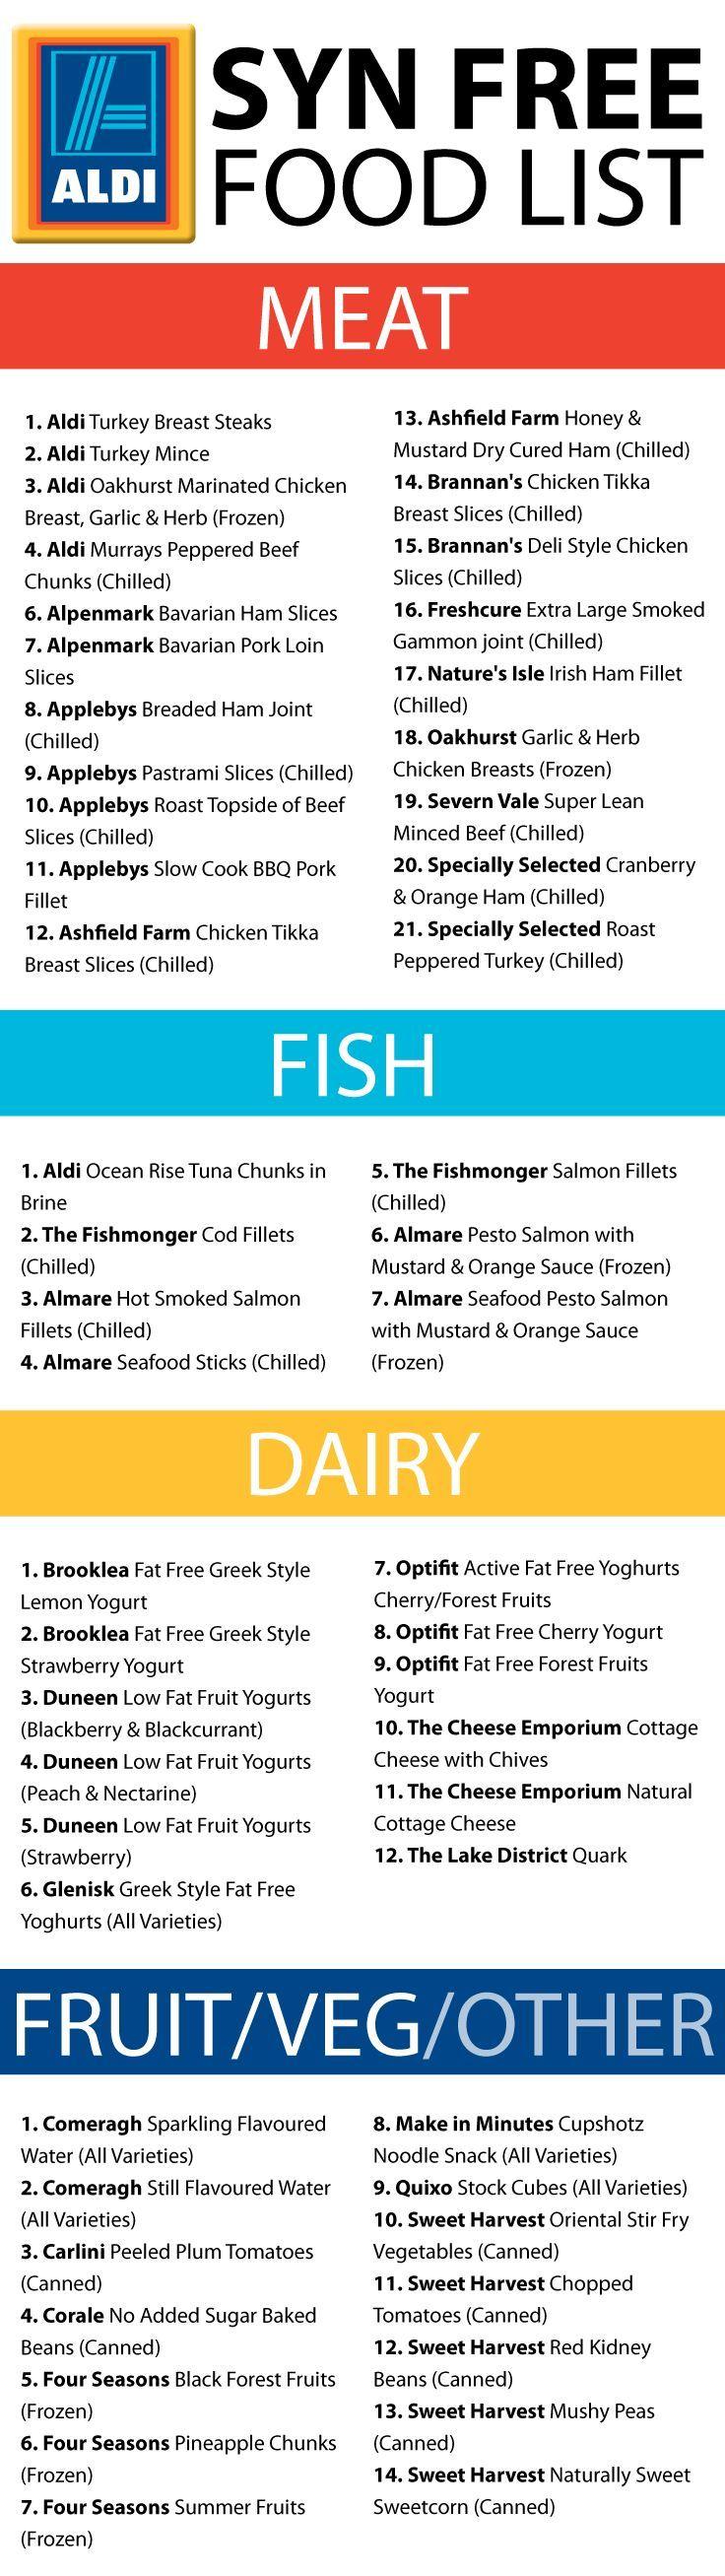 Best 25 Slimming World Syns Online Ideas On Pinterest Slimming Workd Slimming World Snacks